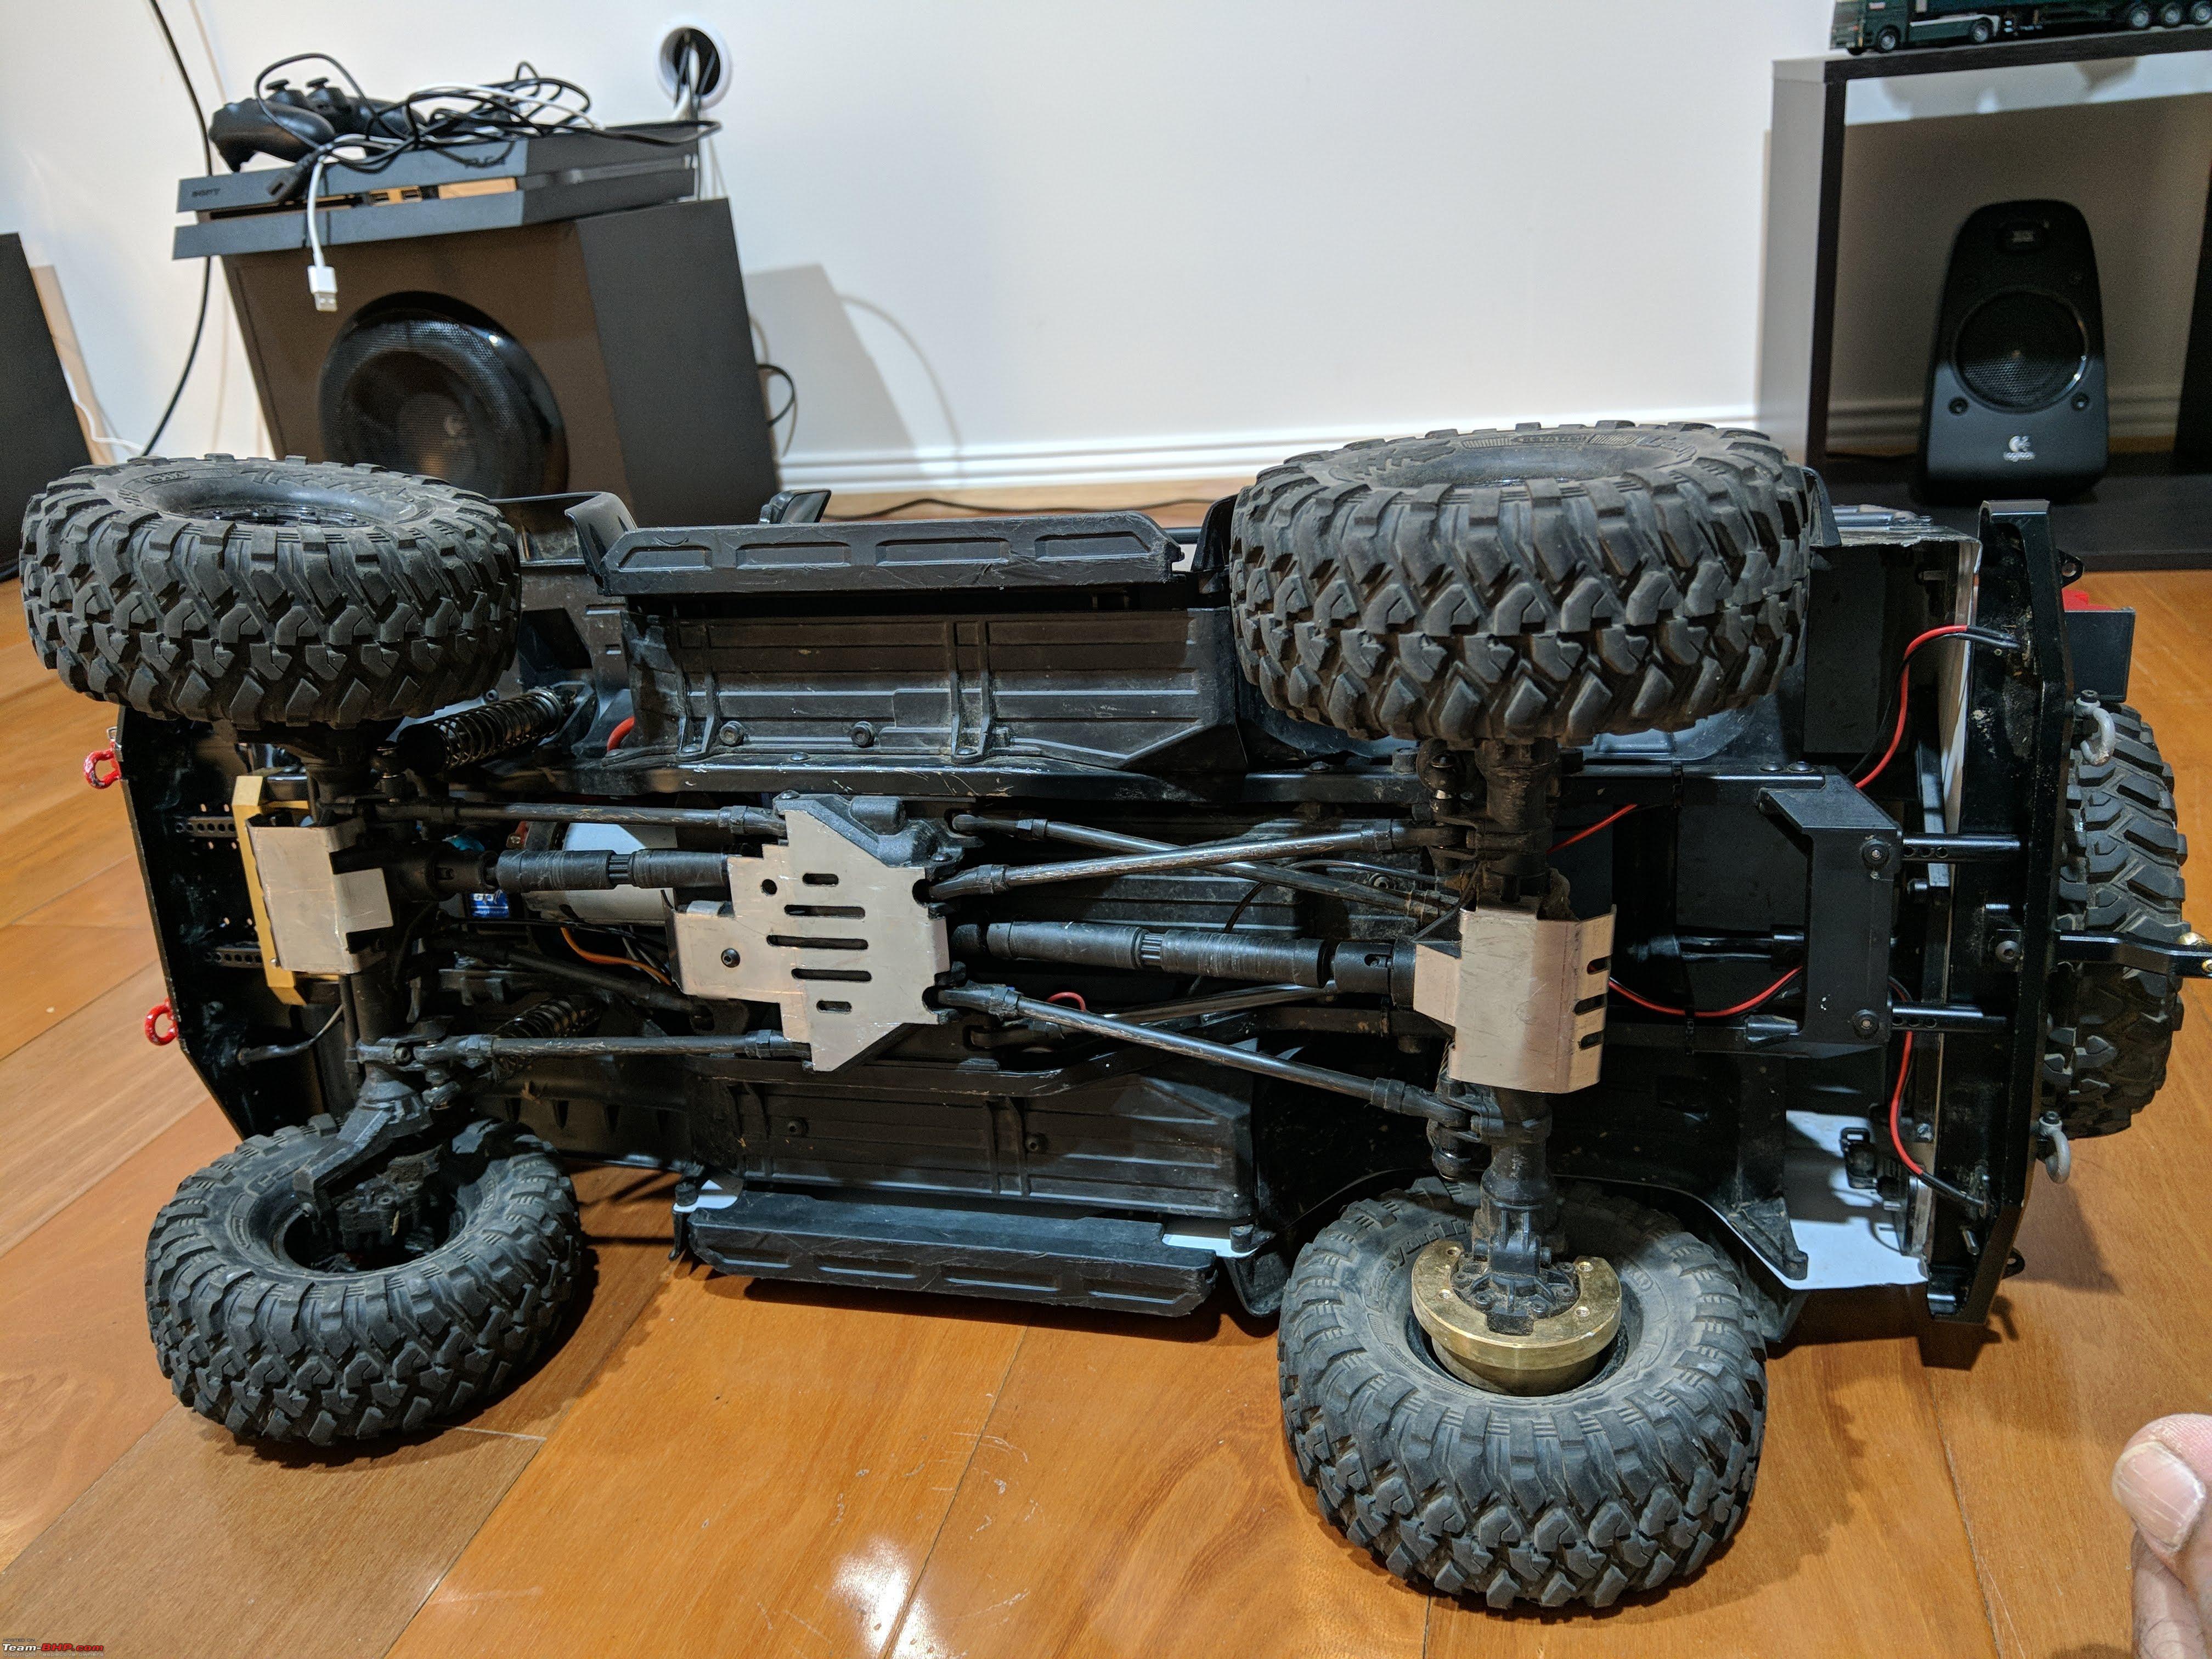 Team-BHP RC Rock Crawlers 4x4 Thread - Team-BHP